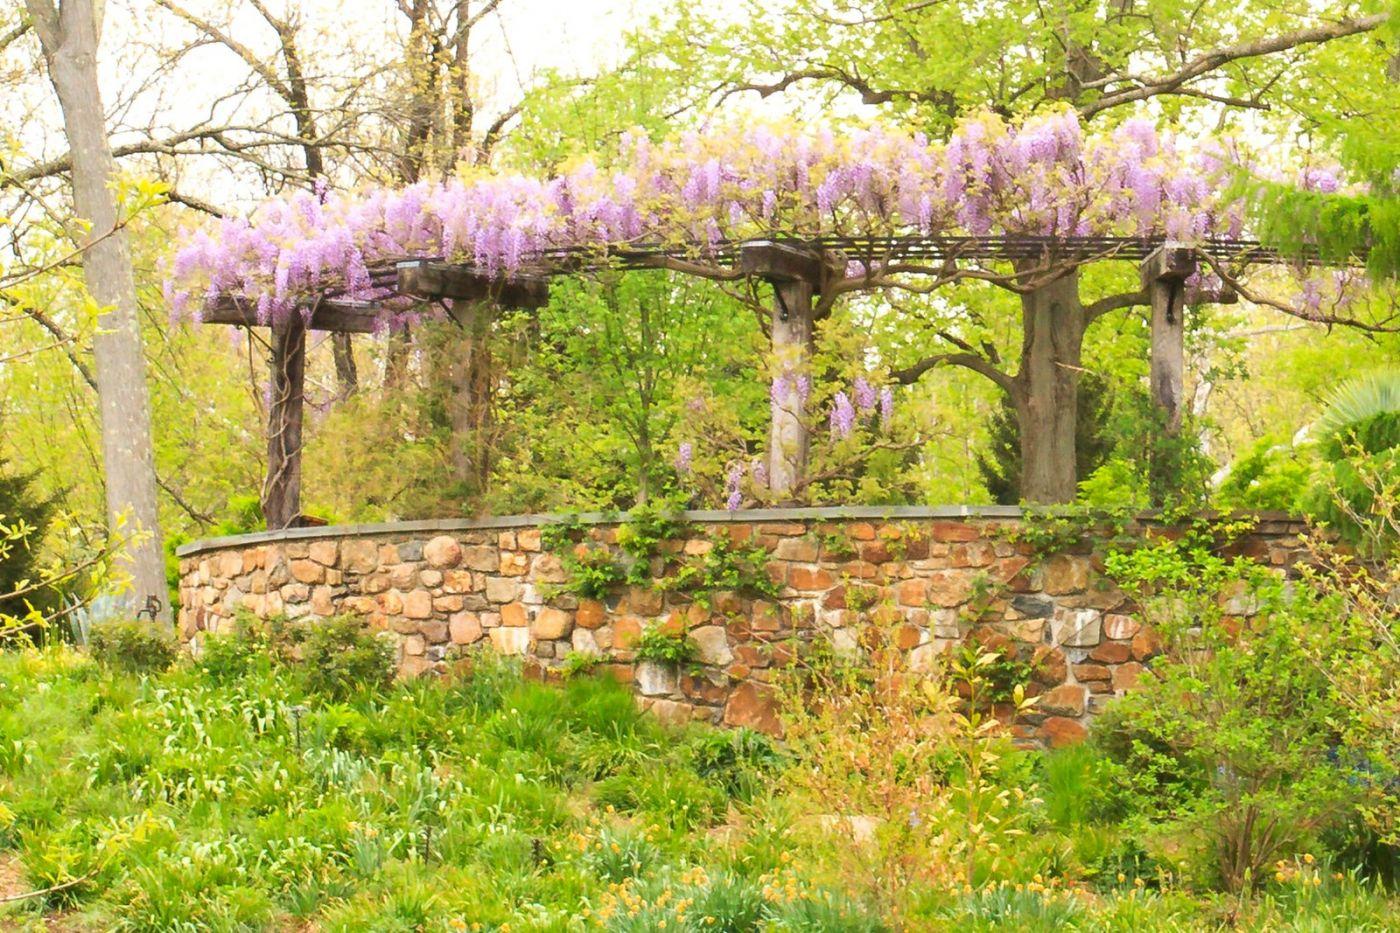 Chanticleer花园,那年盛开的紫藤花_图1-8